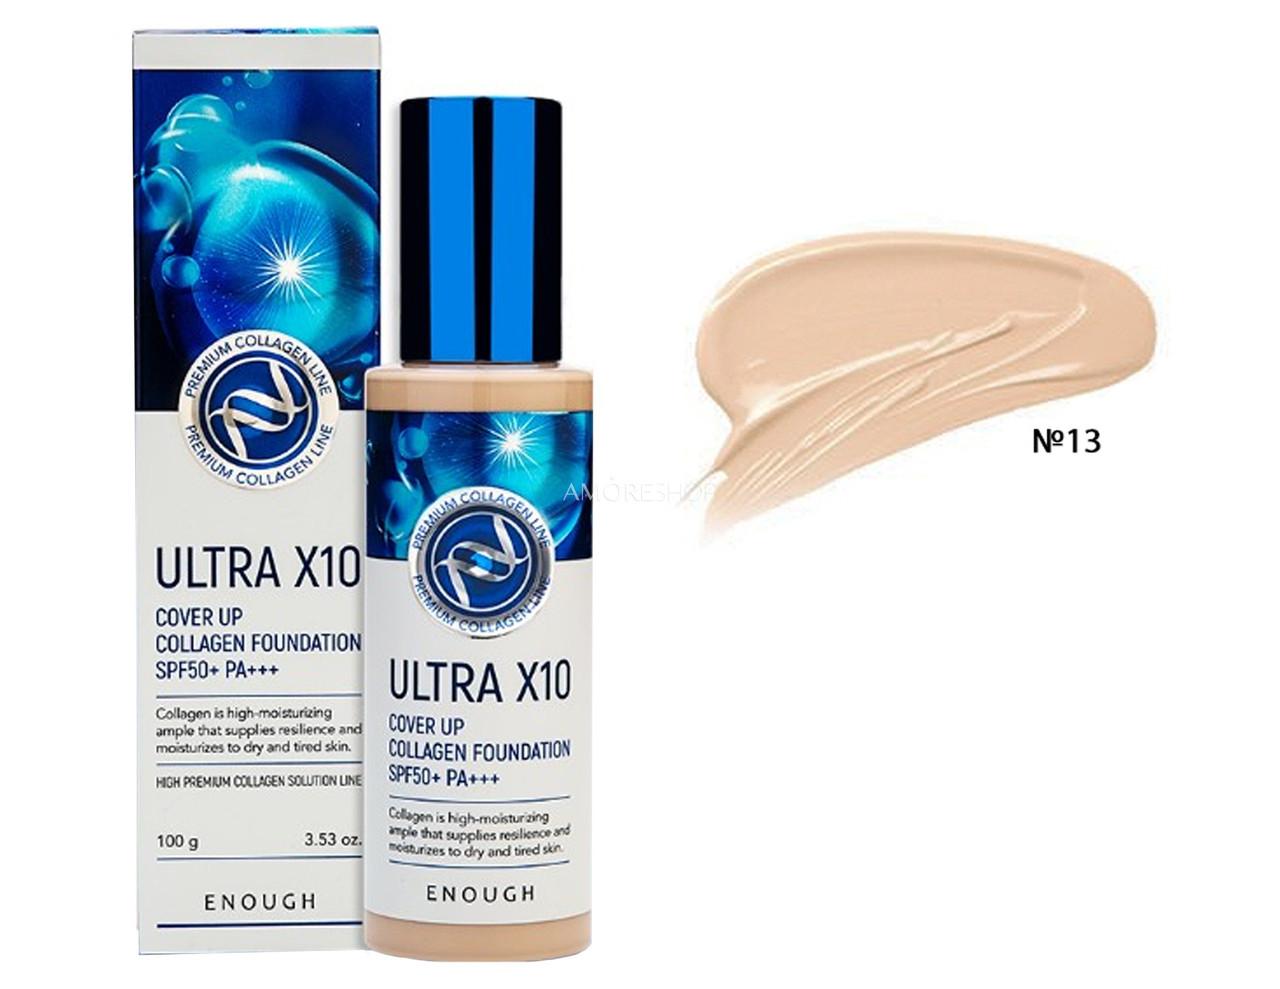 Тональная основа Enough Ultra X10 Cover Up Collagen Foundation SPF50+ PA тон 13